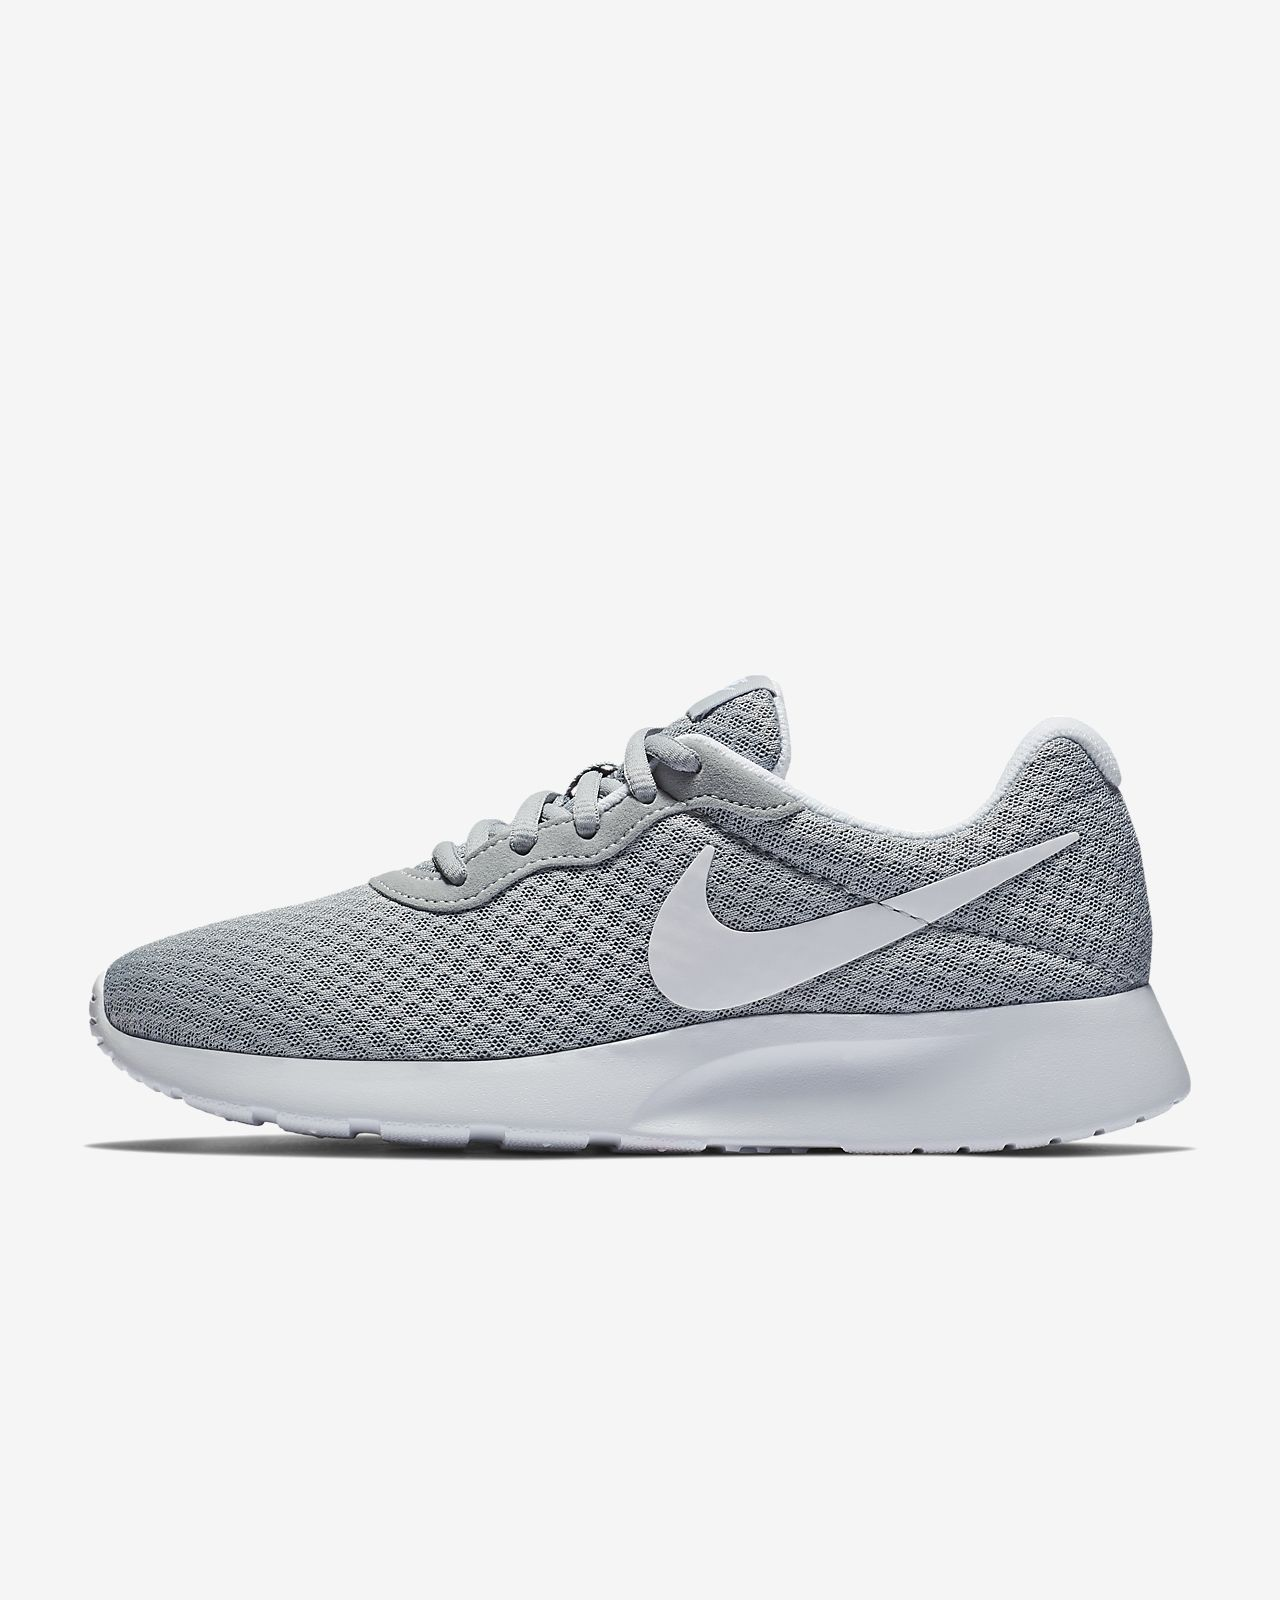 info for 38f6f eb331 Low Resolution Nike Tanjun Kadın Ayakkabısı Nike Tanjun Kadın Ayakkabısı